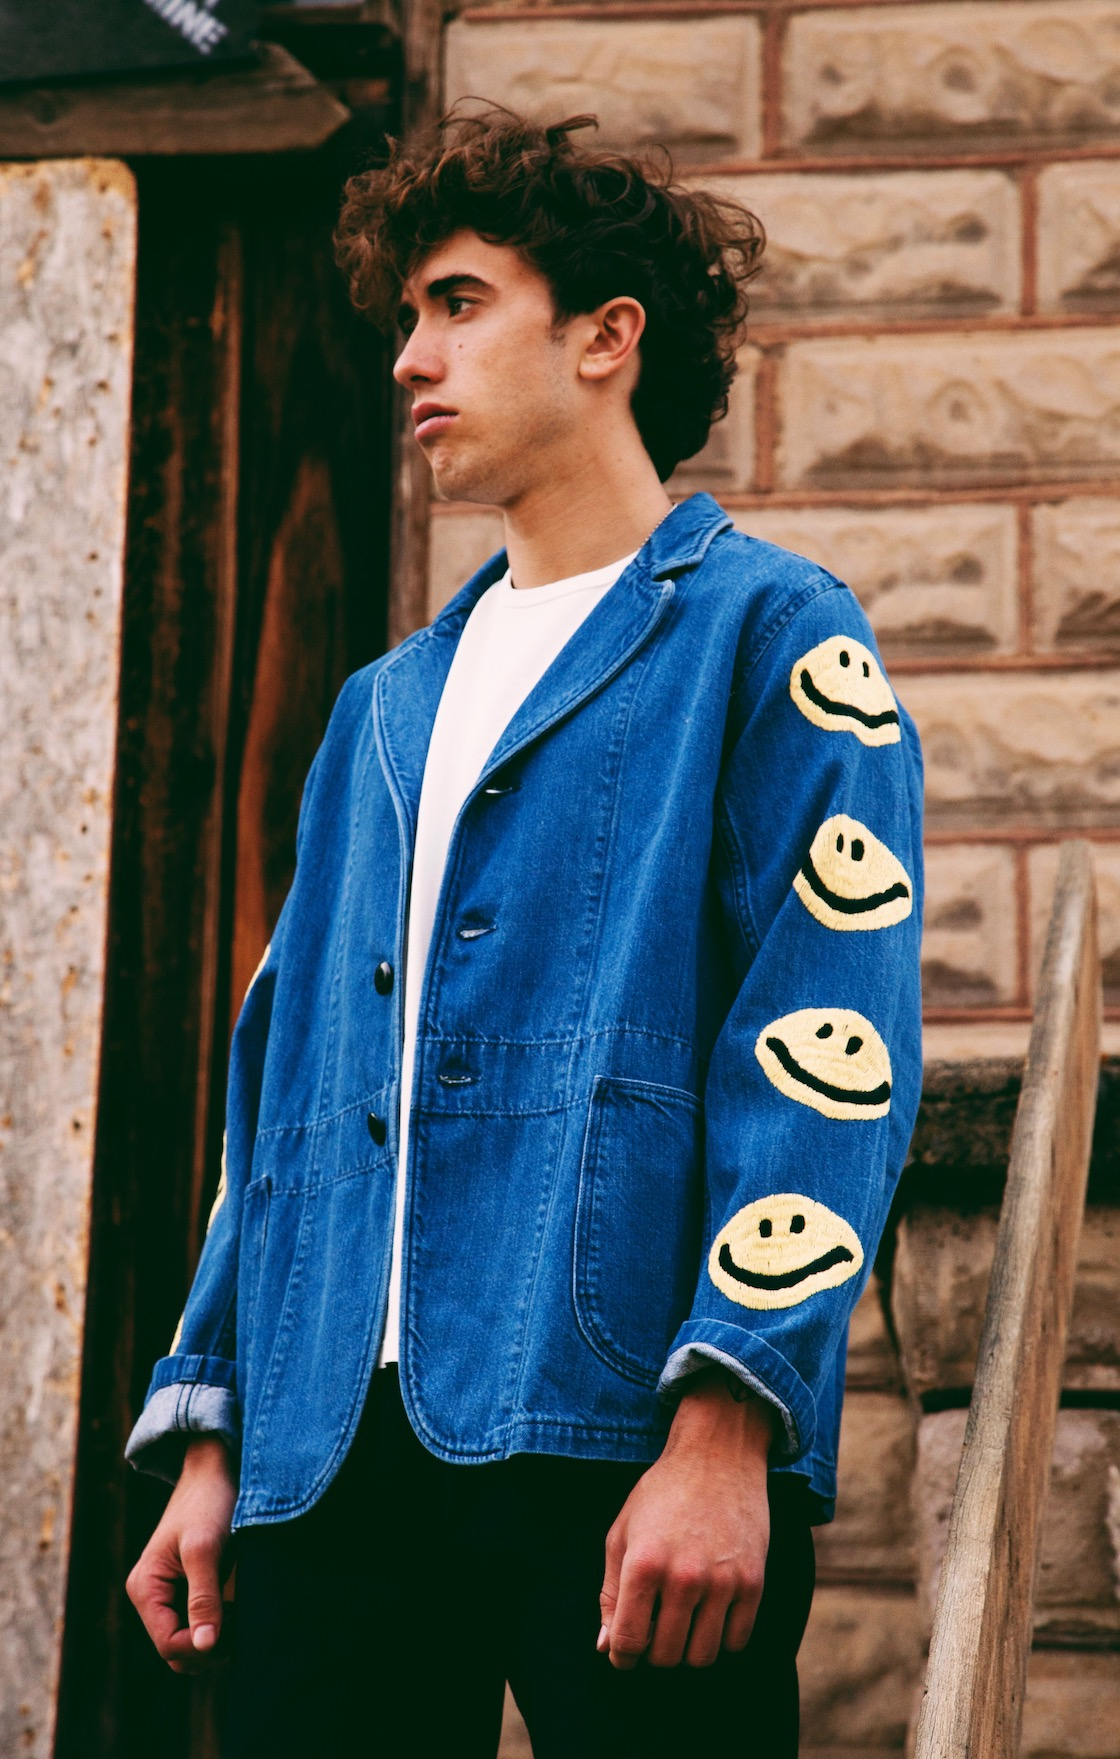 kapital kountry japan smilie shirt jacket on body